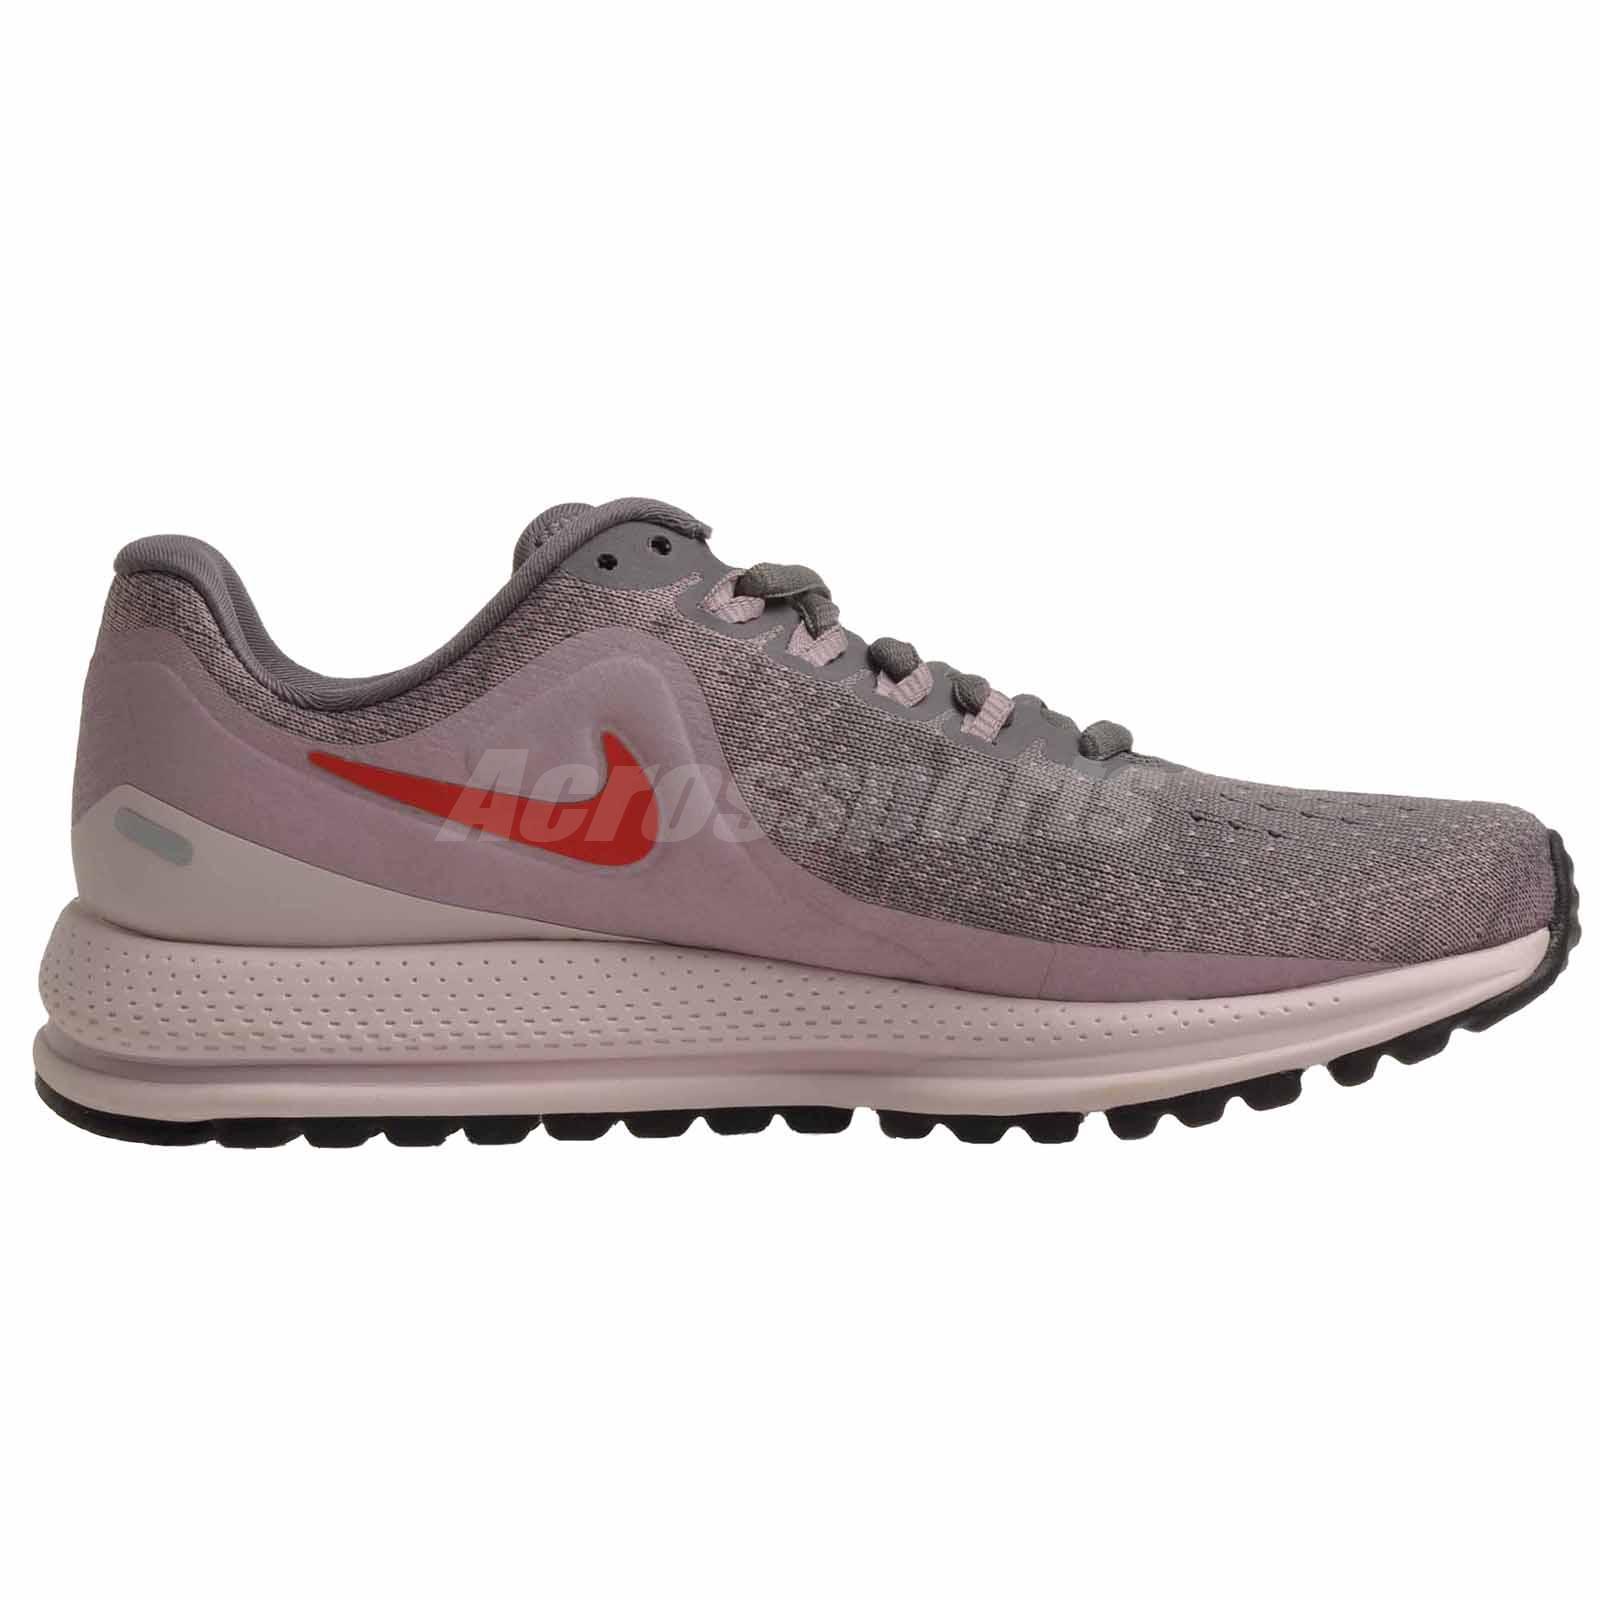 raccolta di sconti moda più desiderabile vendita limitata Nike Wmns Air Zoom Vomero 13 Running Womens Running Shoes NWOB ...